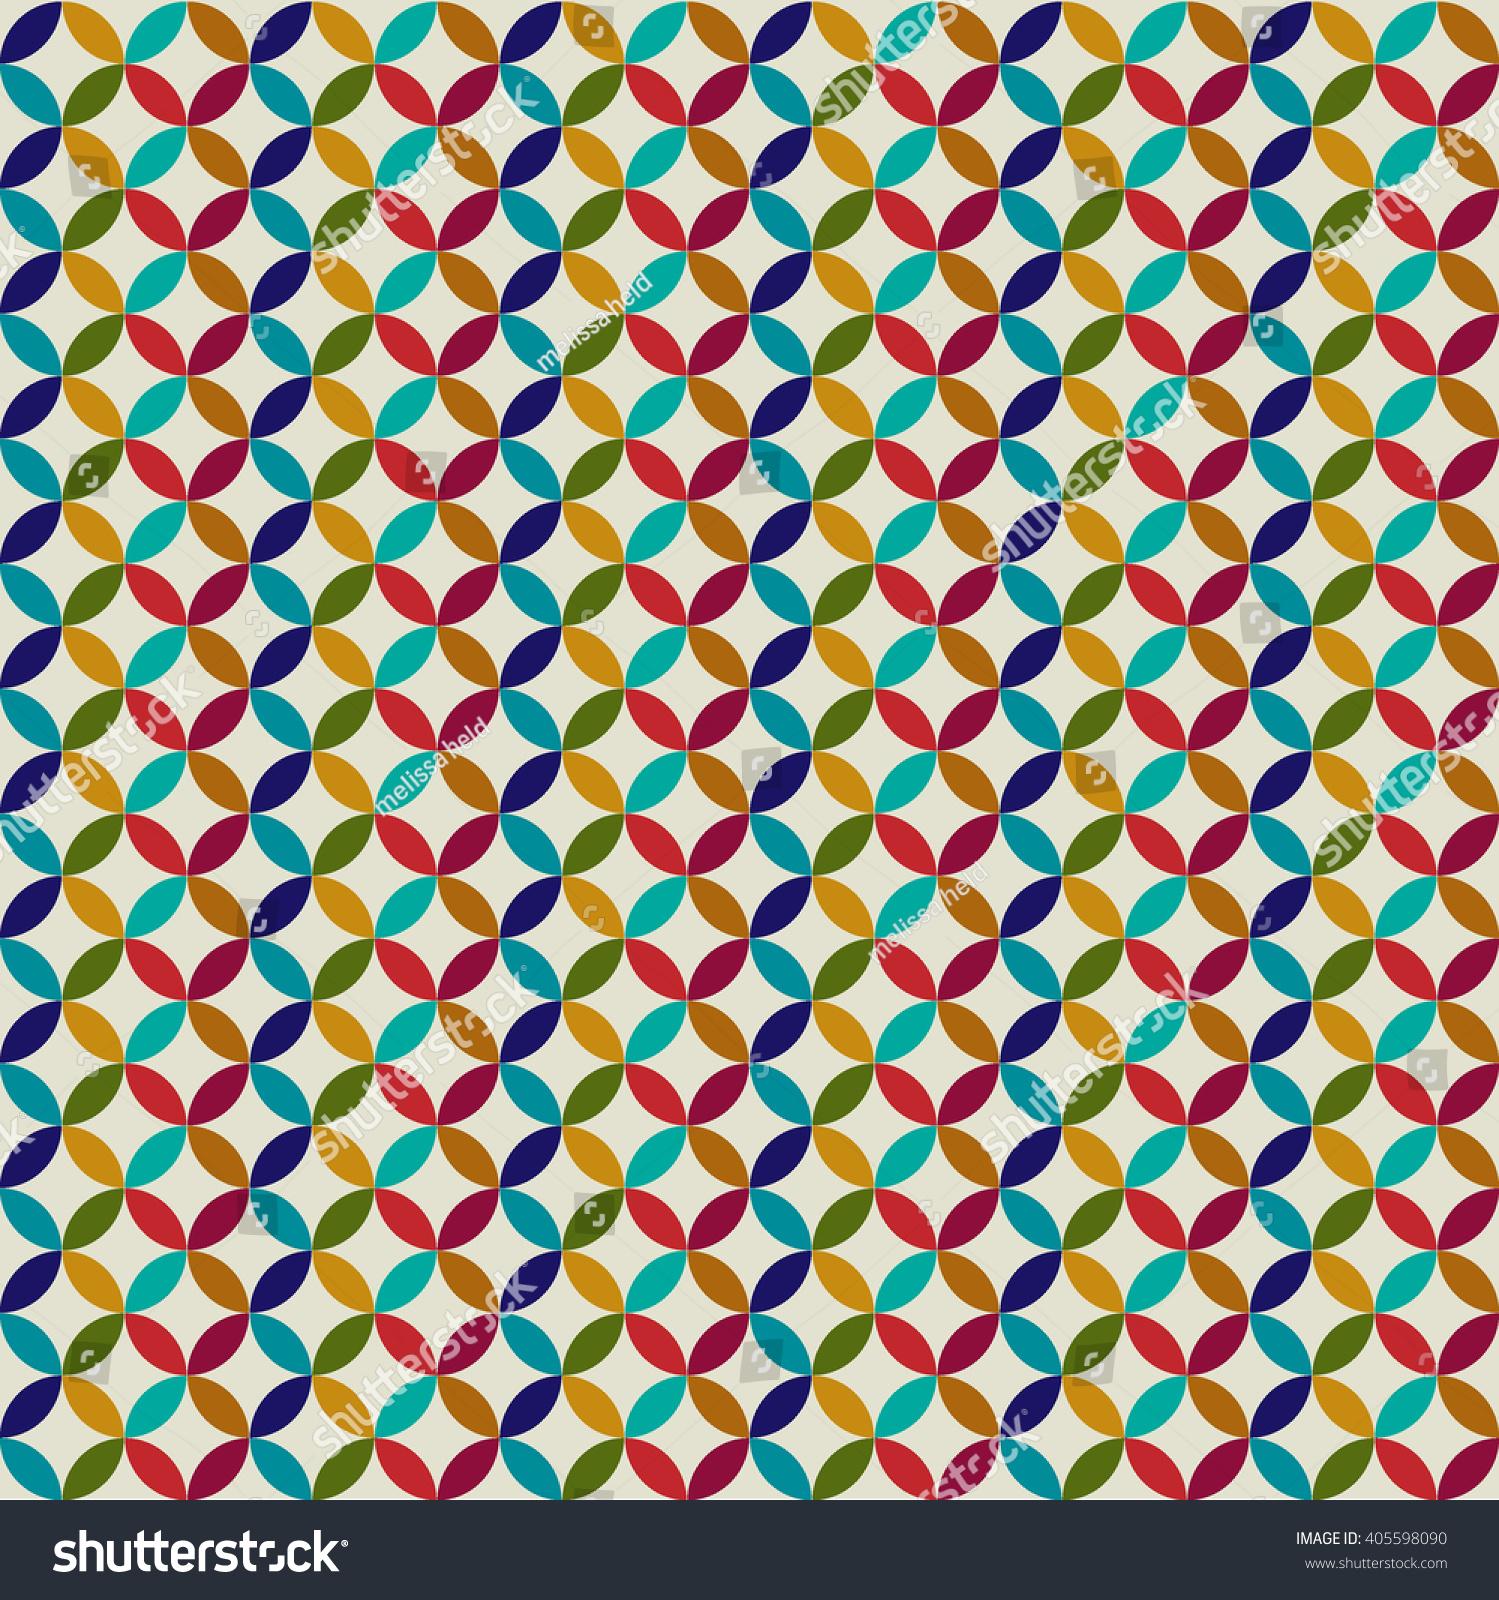 Circle Tiles Circle Tiles Stock Vector 405598090 Shutterstock